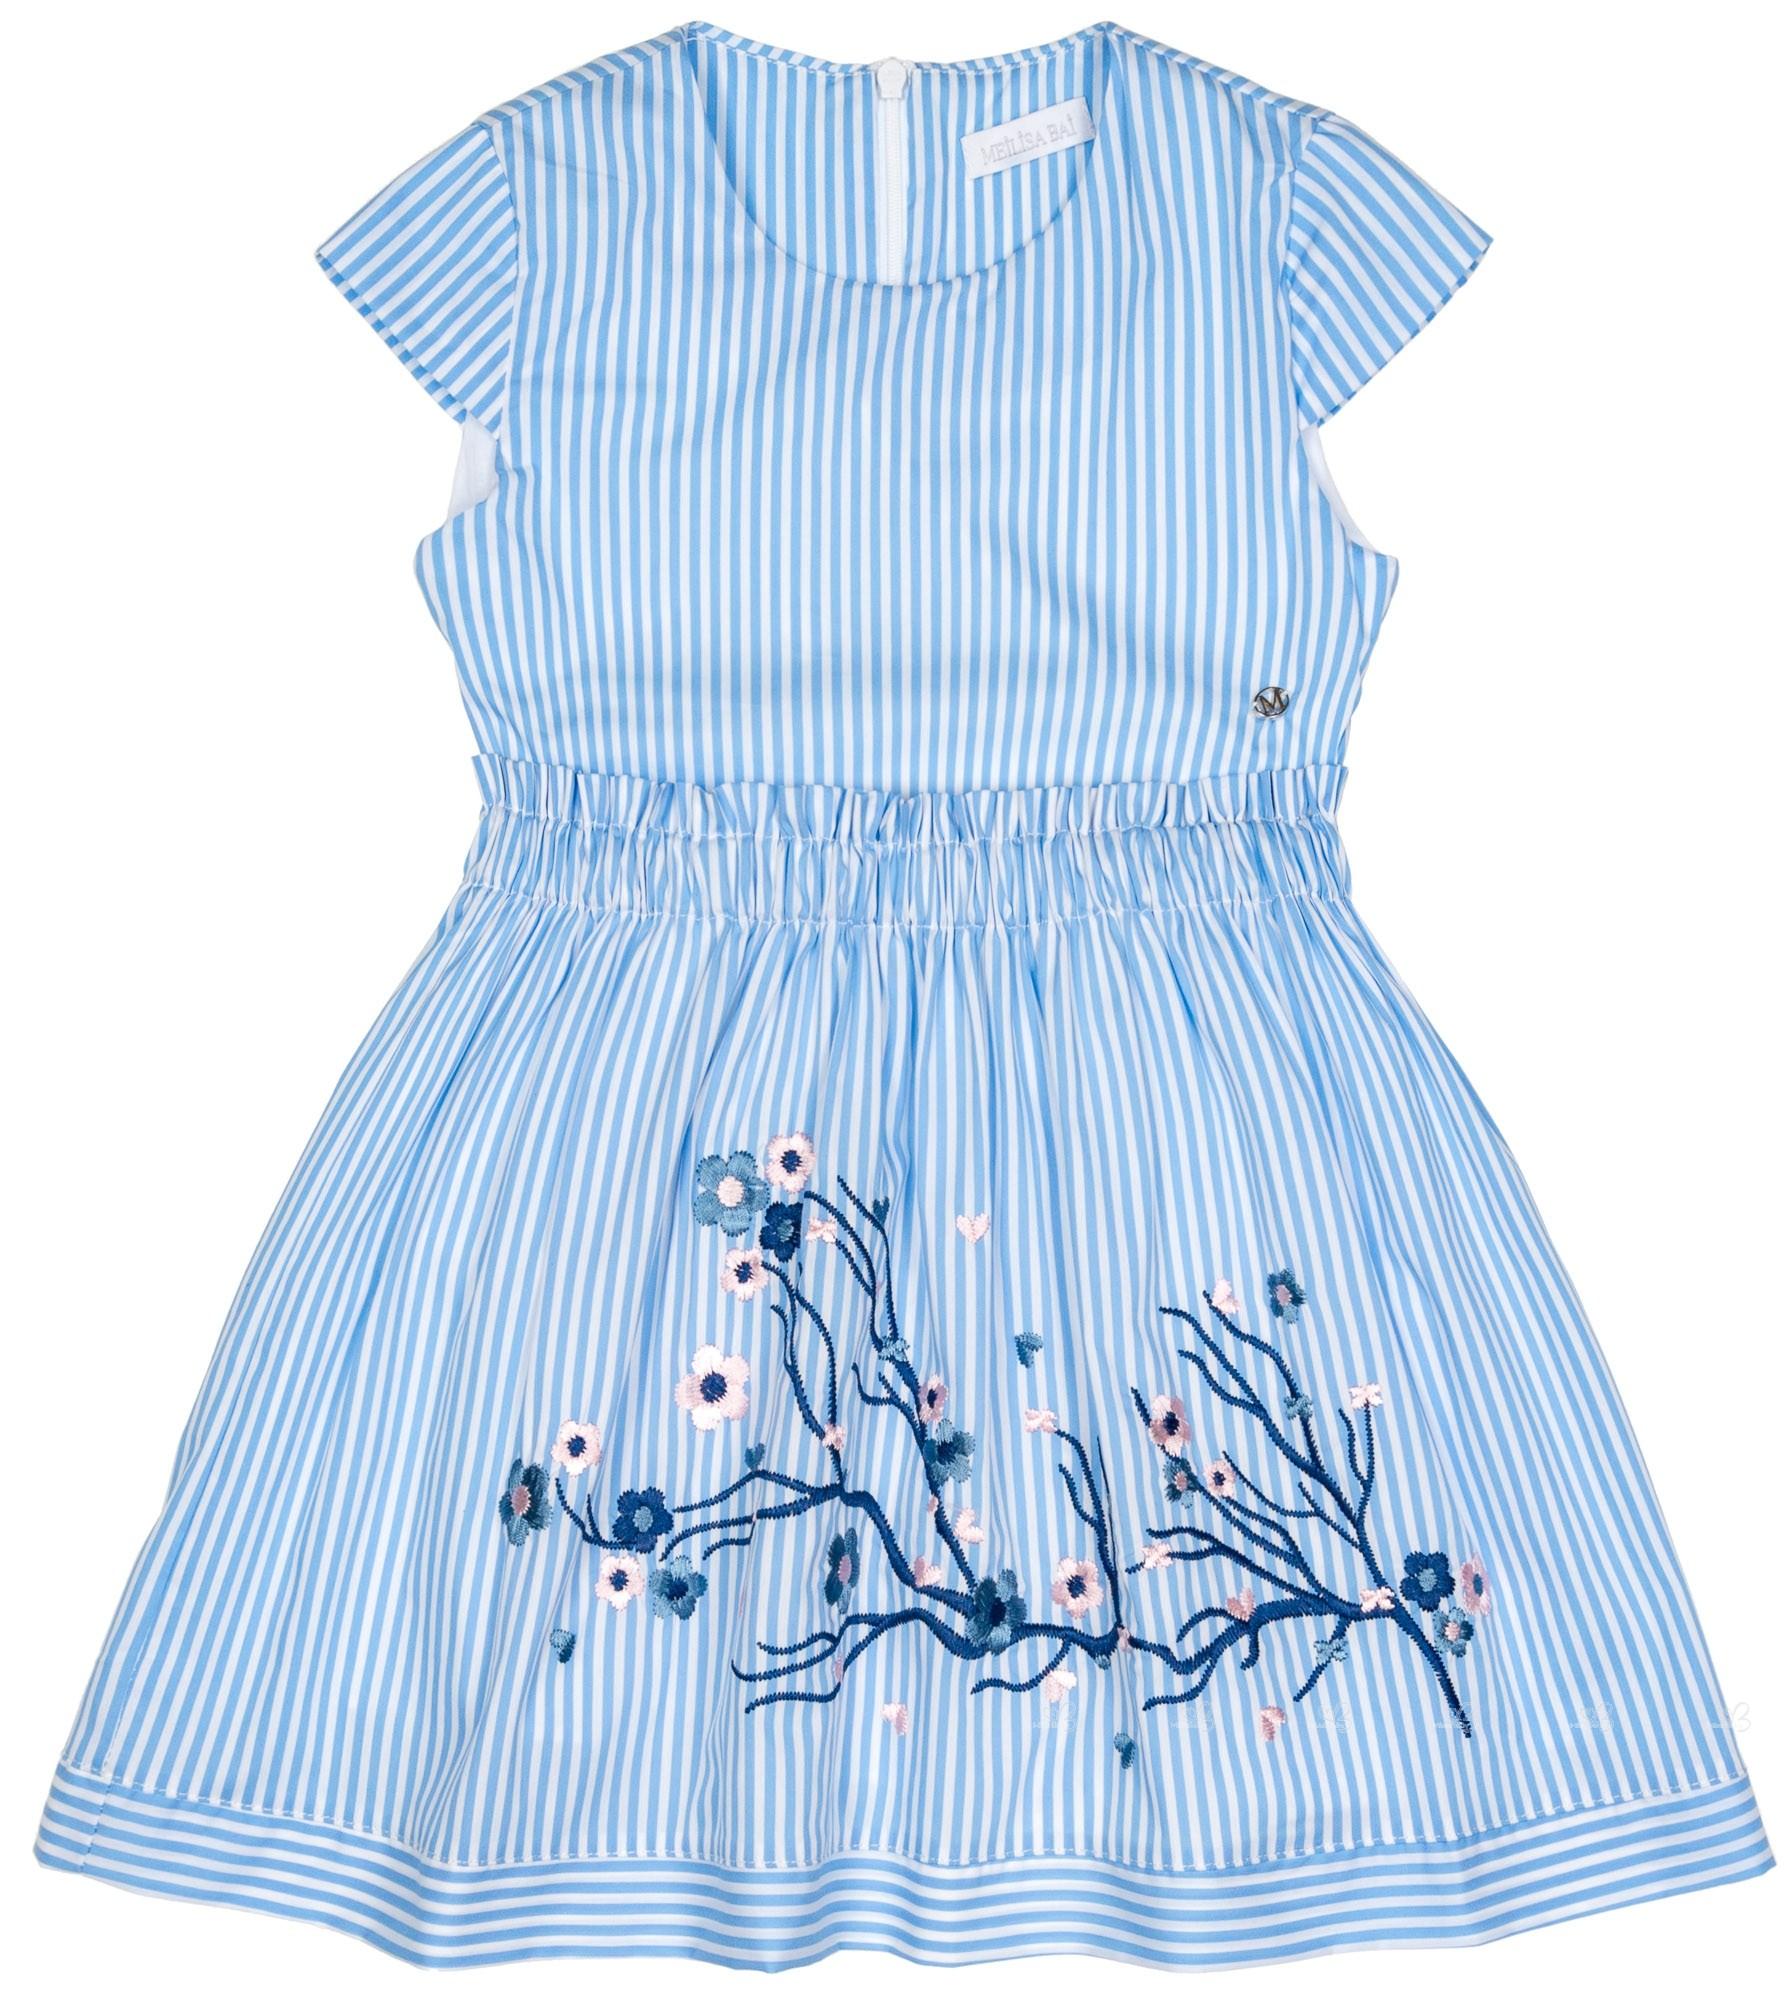 7eec6bcc1 Meilisa Bai Vestido Niña Bordado Floral Rayas Azul   Blanco